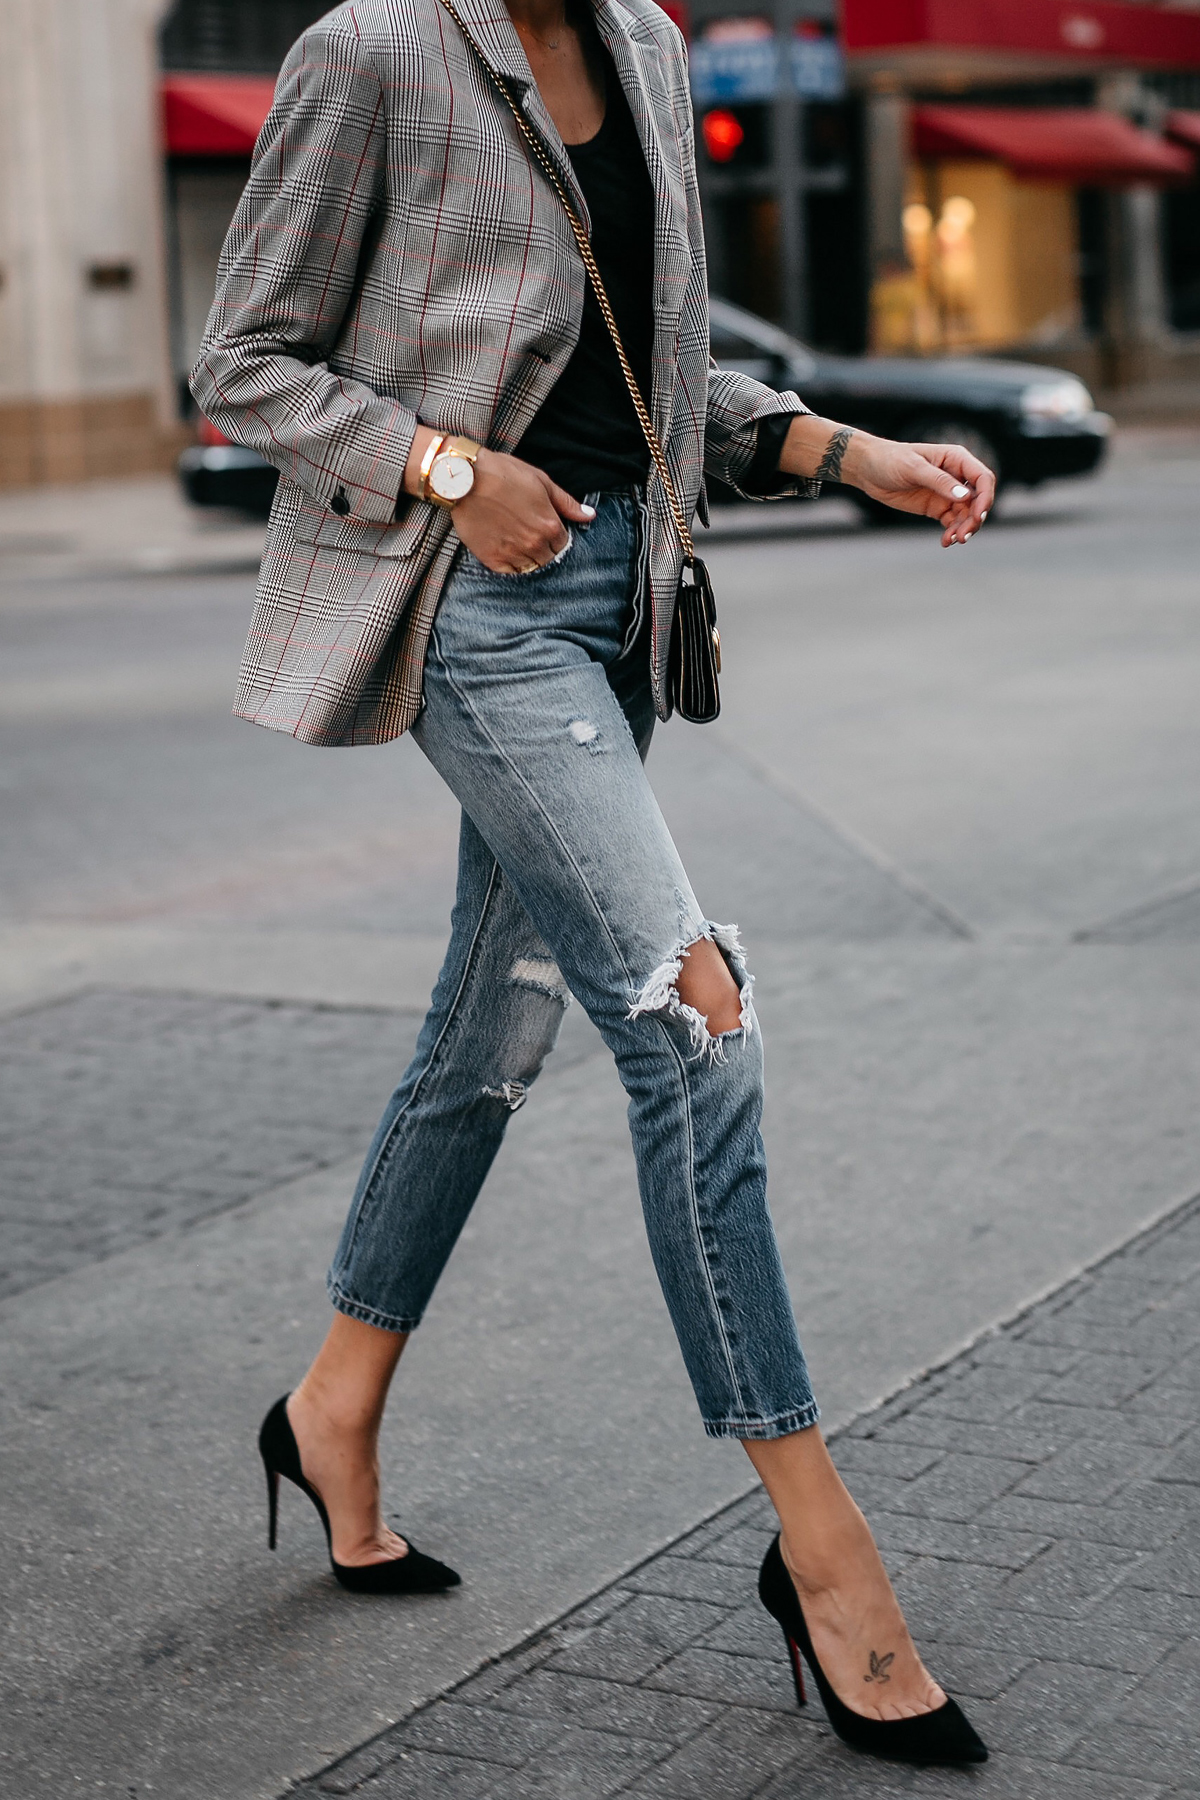 Zara Plaid Blazer Denim Ripped Jeans Gucci Marmont Handbag Christian Louboutin Black Pumps Fashion Jackson Dallas Blogger Fashion Blogger Street Style